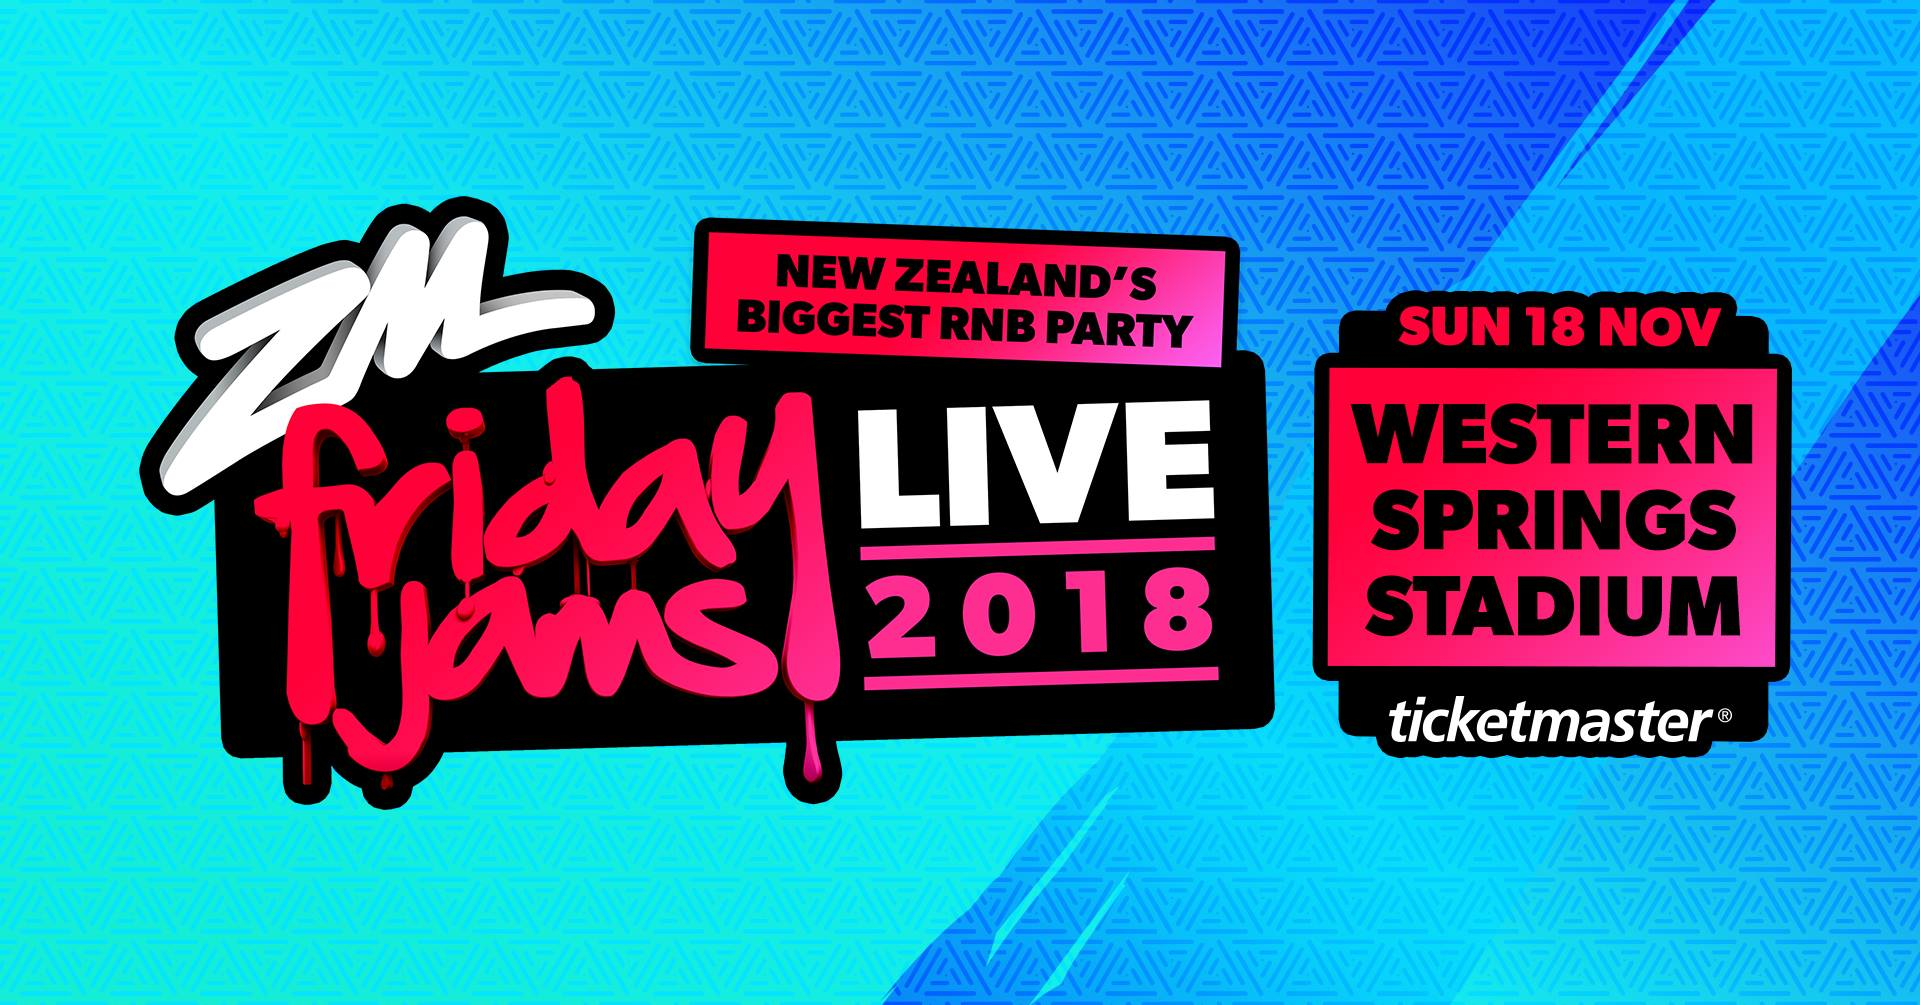 ZM Friday Jams Live